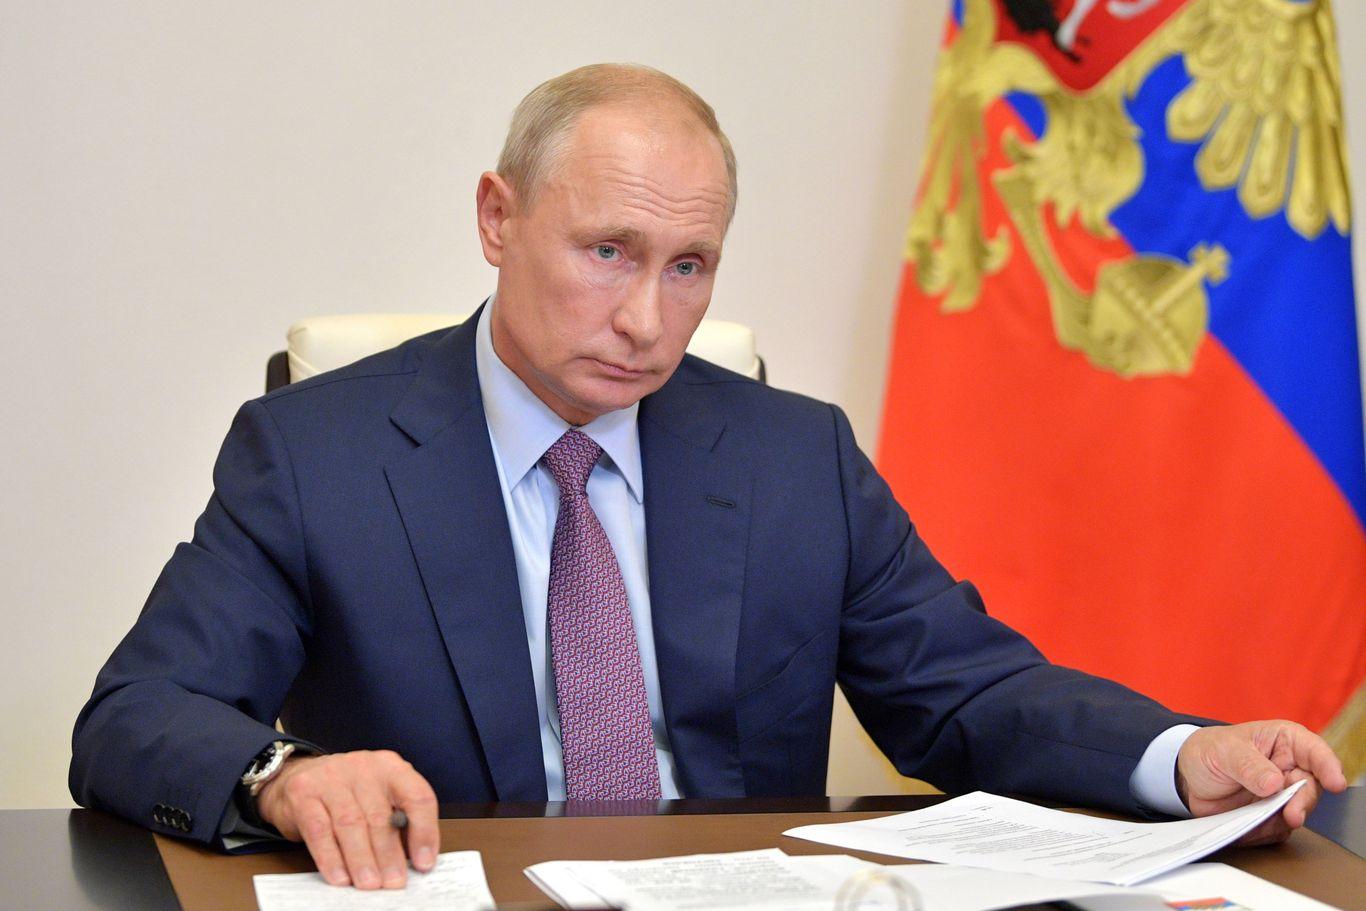 Putin mandates face masks as Russia combats second COVID-19 wave